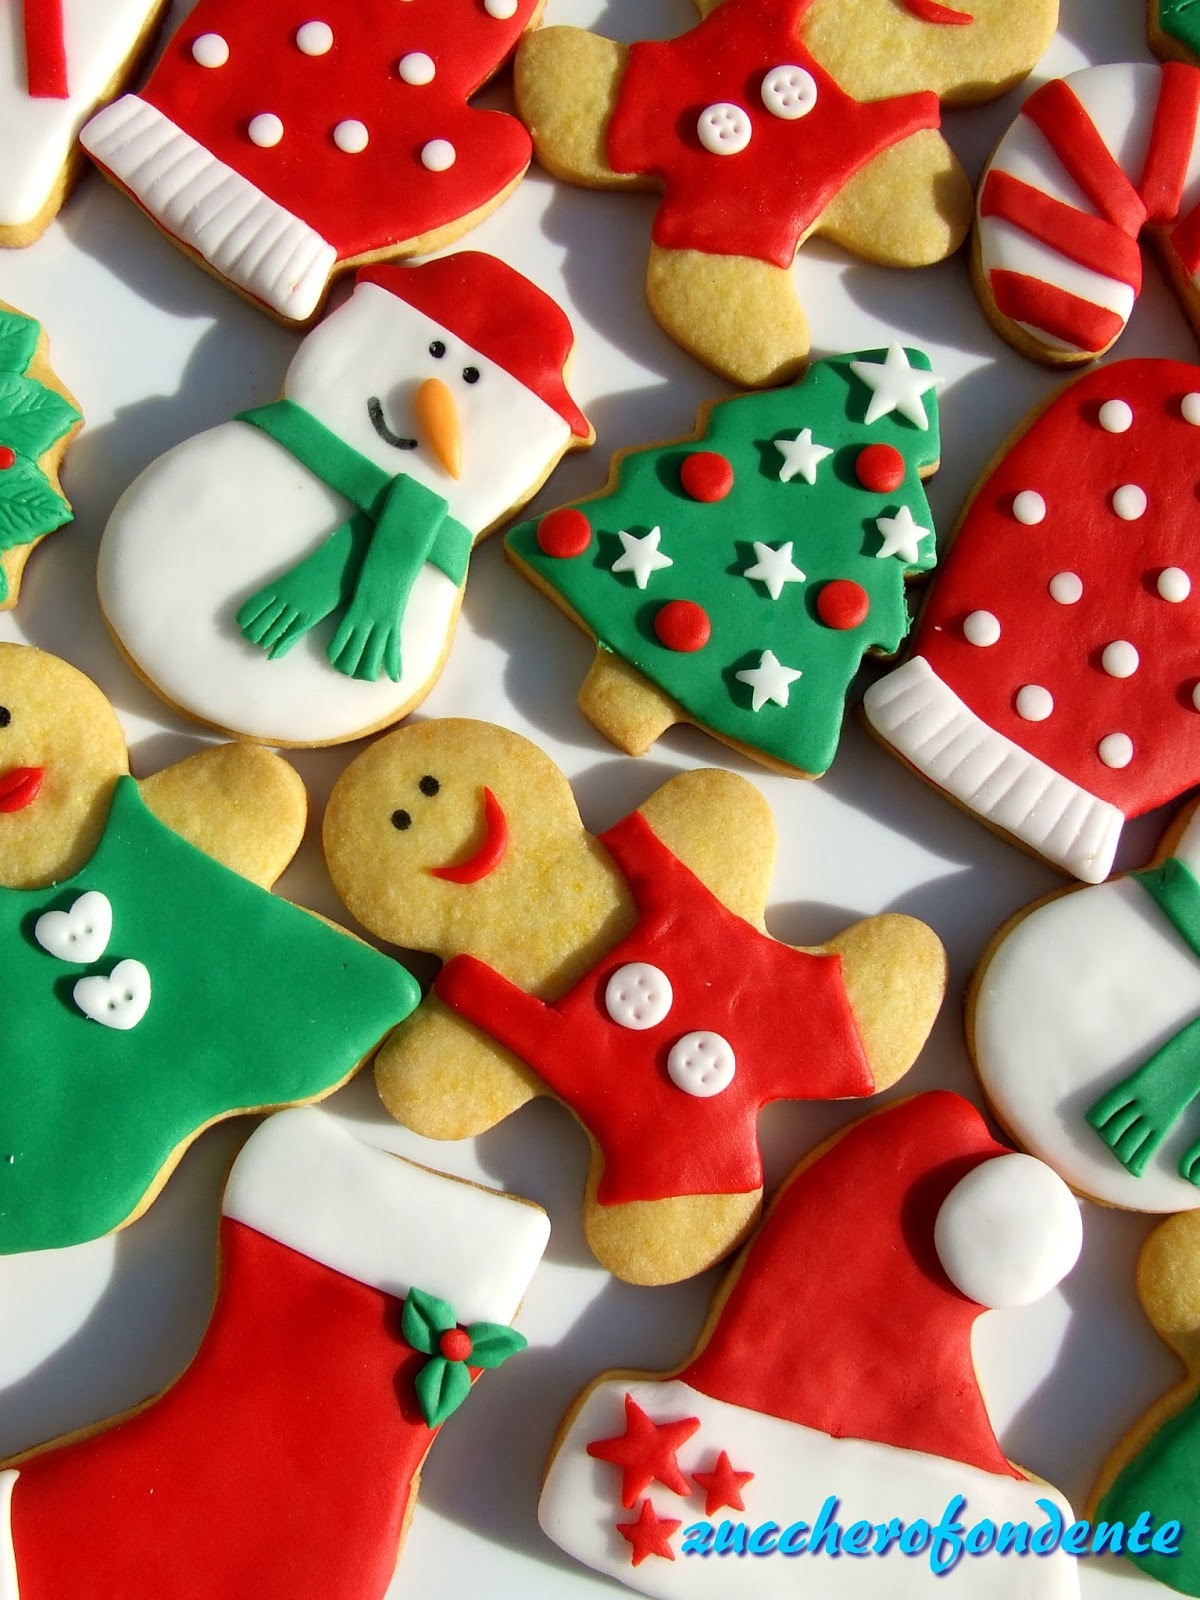 Biscotti Natale Pasta Di Zucchero.Zuccherofondente Biscotti In Pasta Di Zucchero Ed E